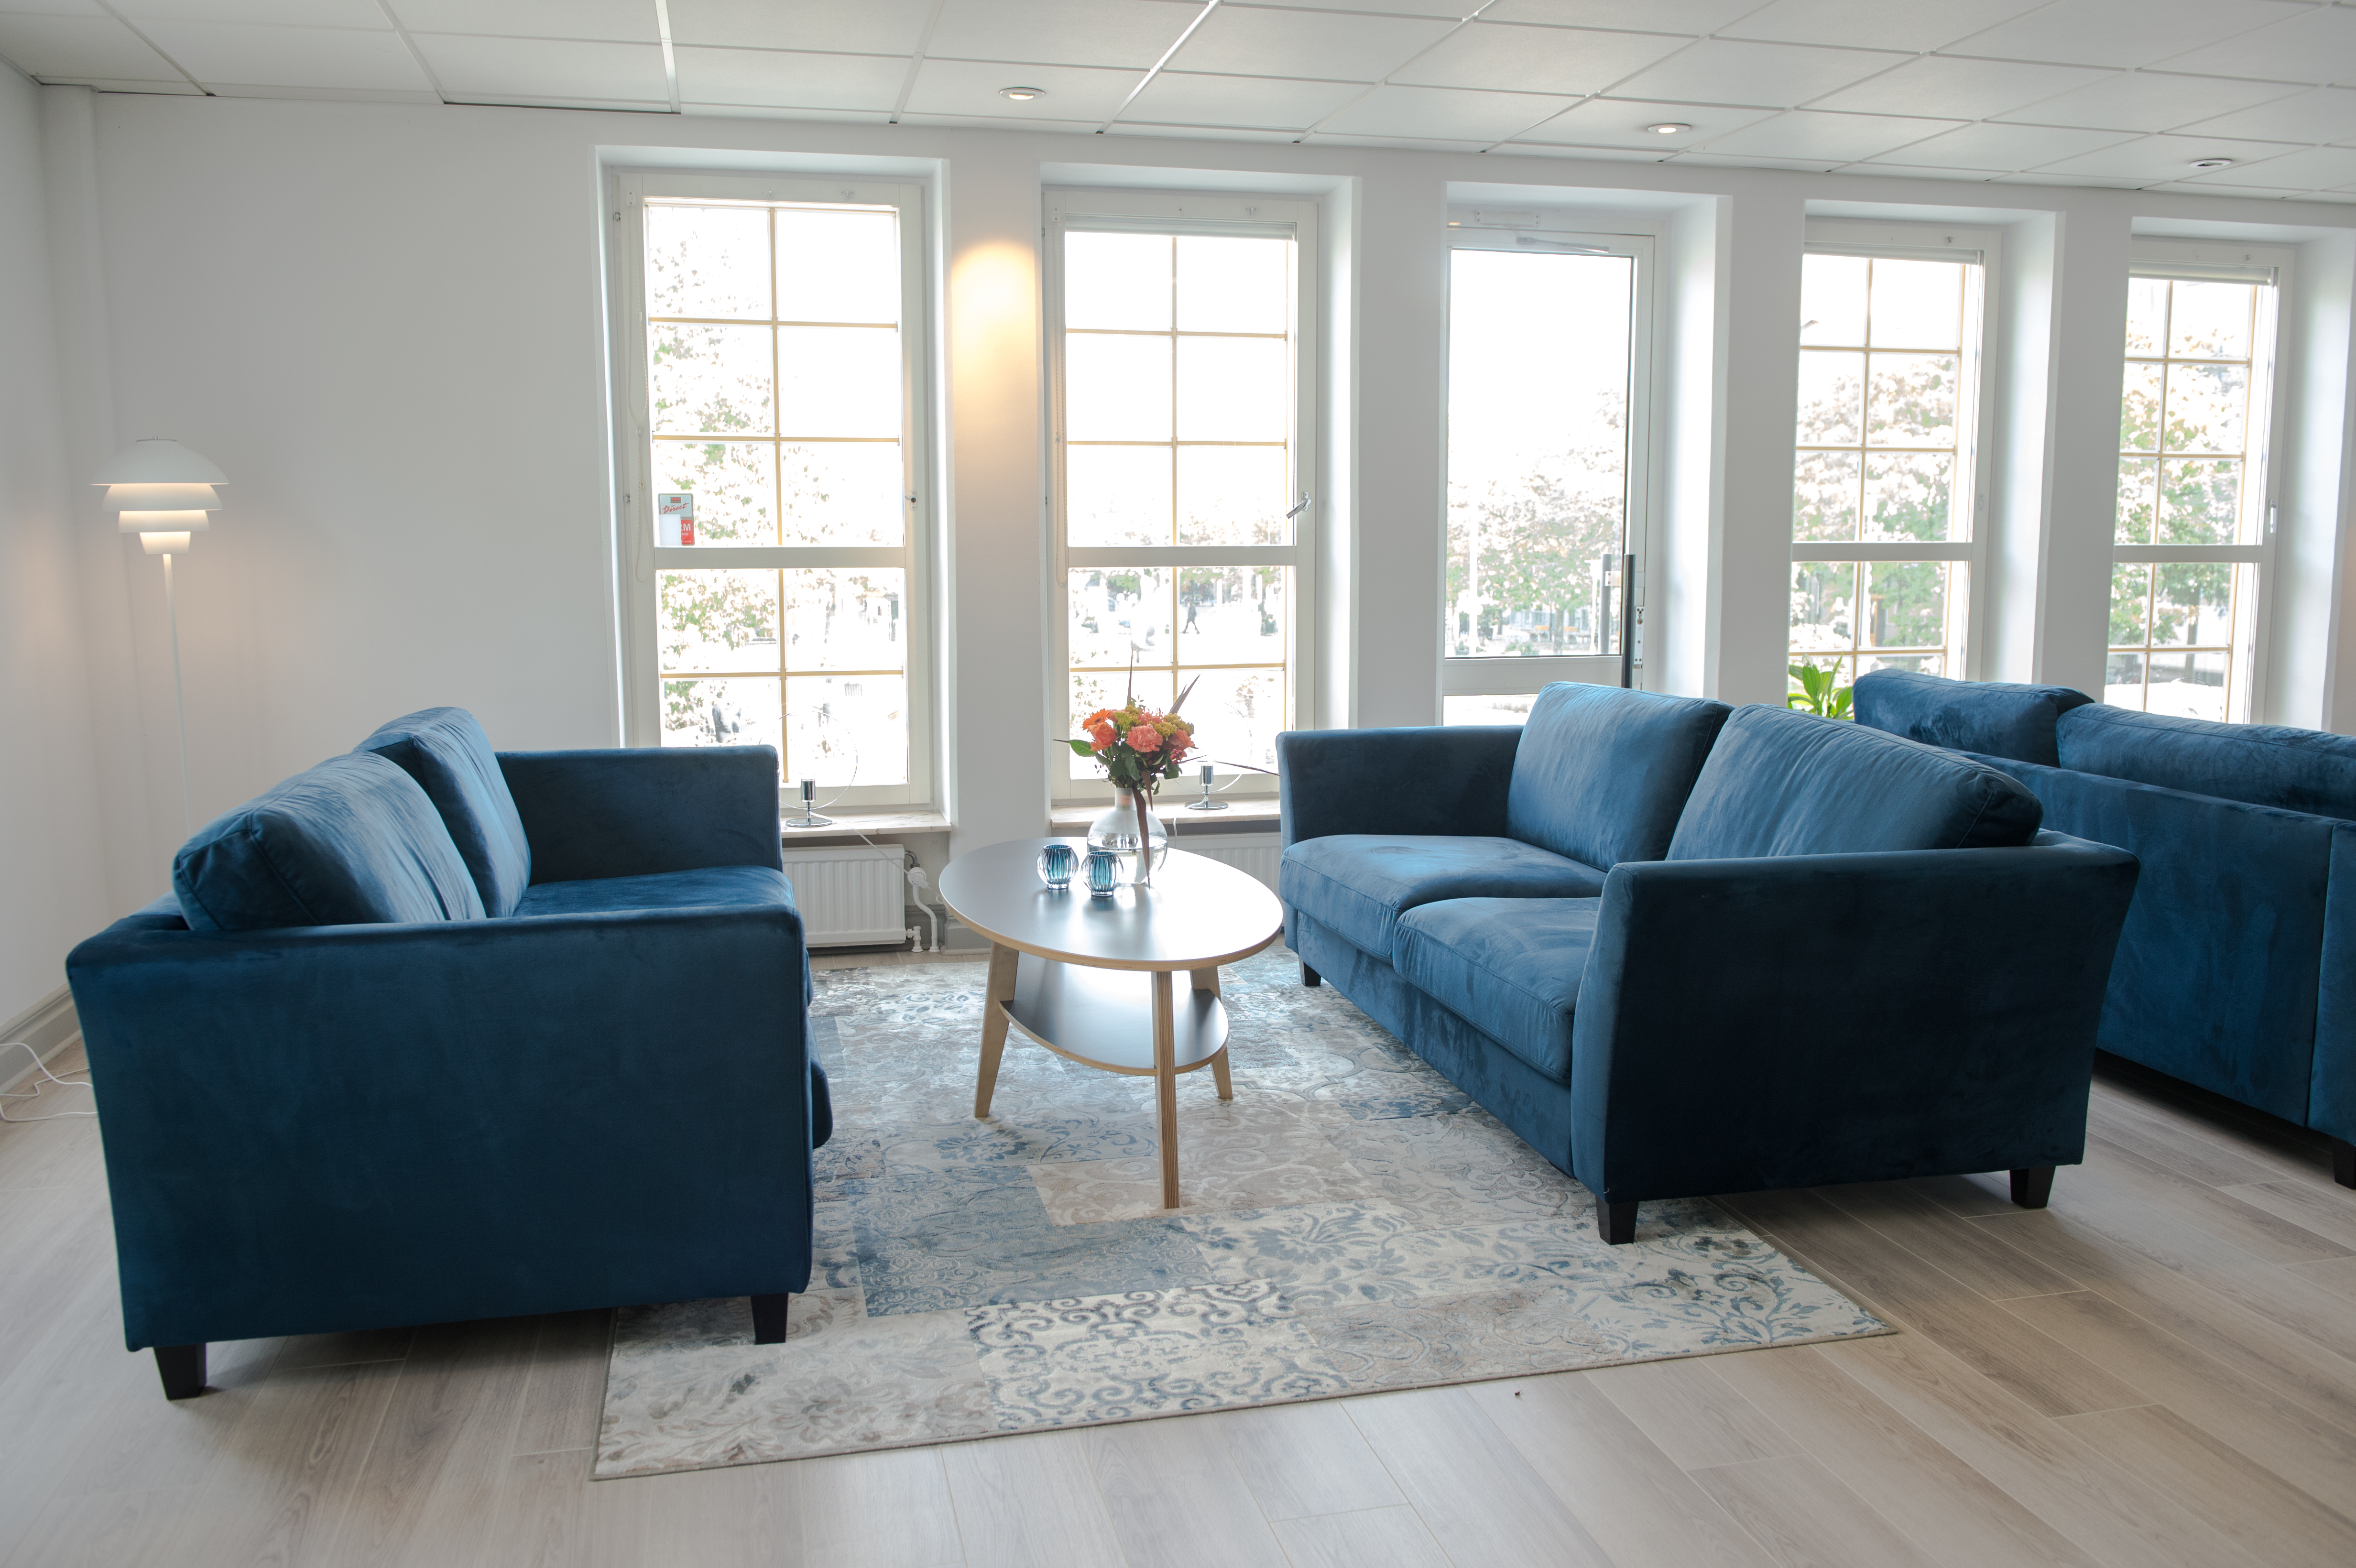 En soffgrupp i blått med fönster i bakgrunden